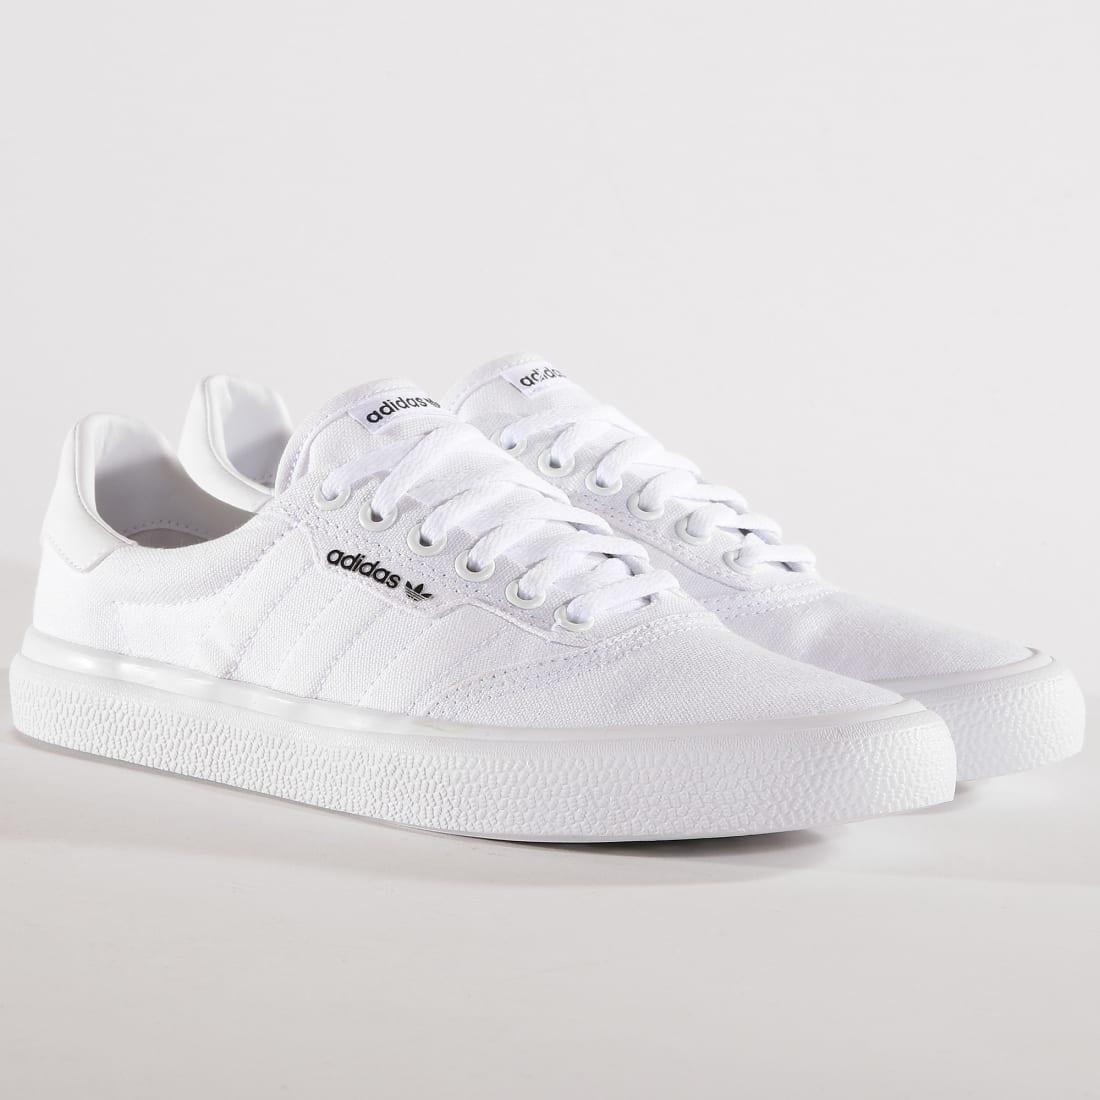 adidas Baskets 3MC Vulc B22705 Footwear White Gold